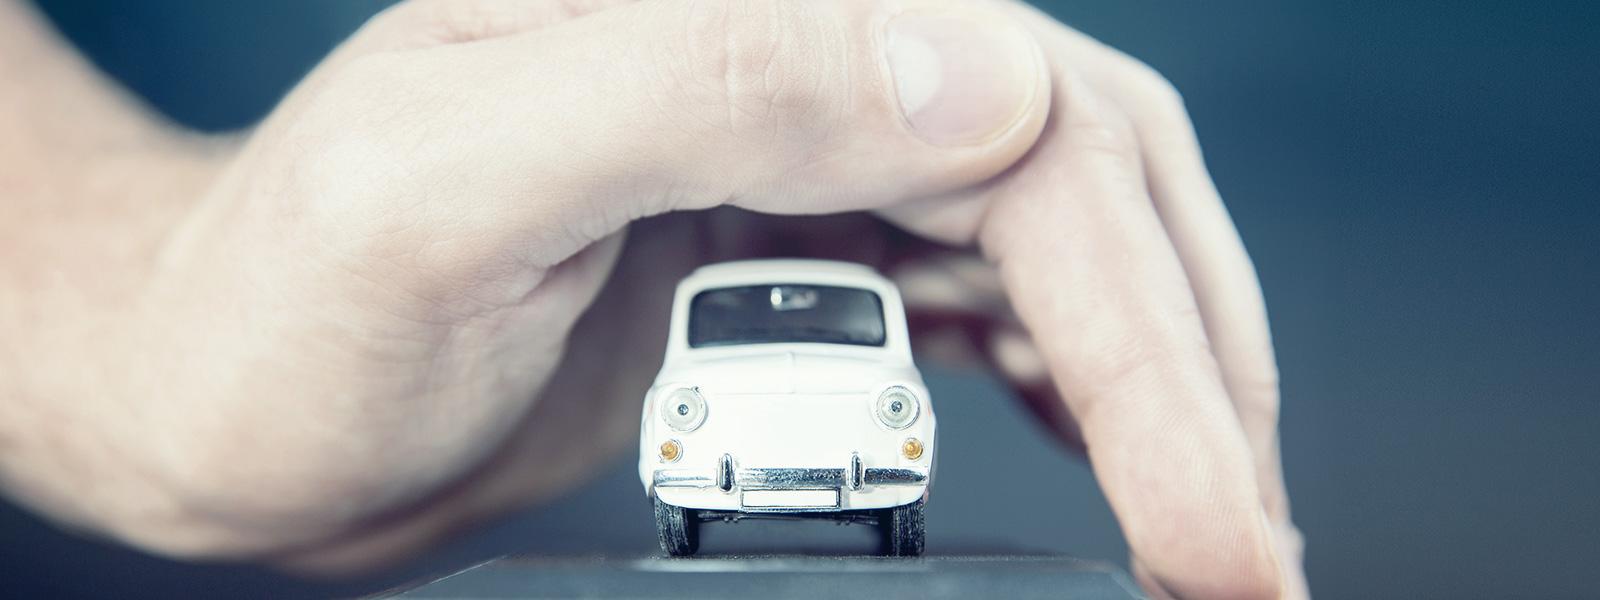 contratar-seguro-carros-usados-blog-ceabs-vale-pena